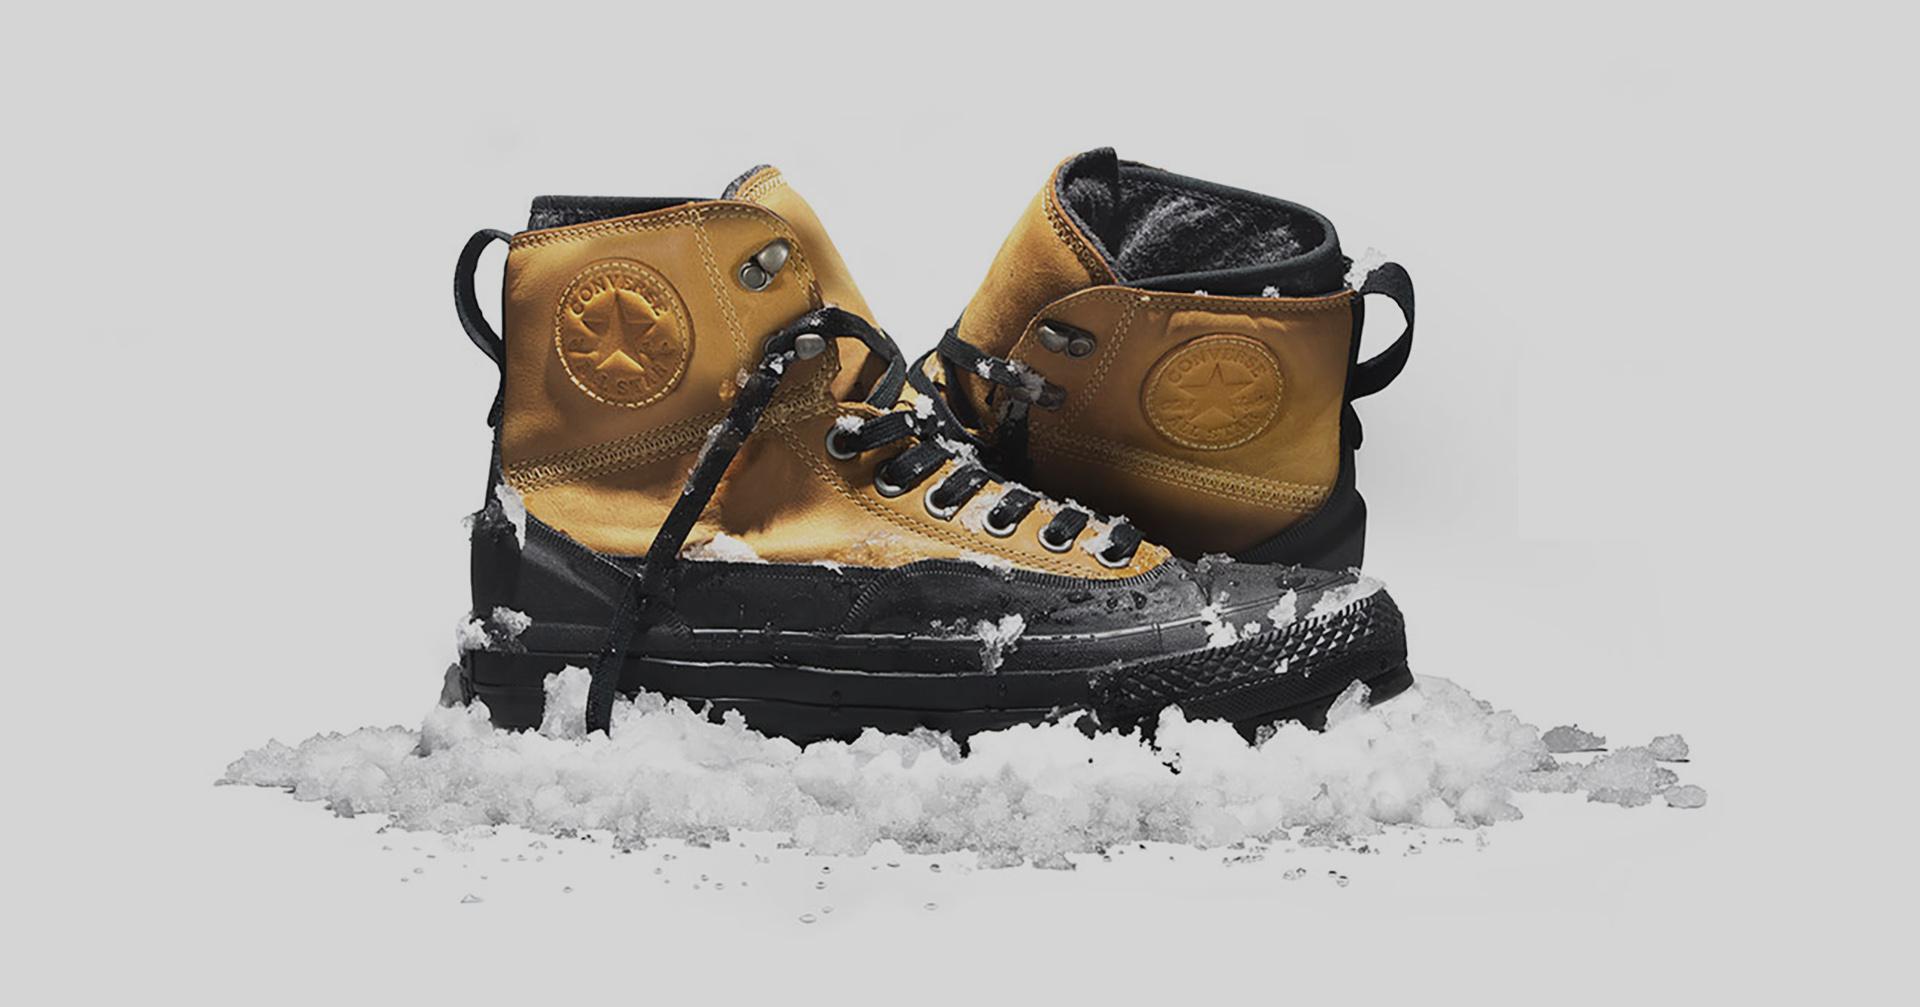 7a638b24eb89a3 Chuck Taylor All Star Tekoa Boot - InsideHook